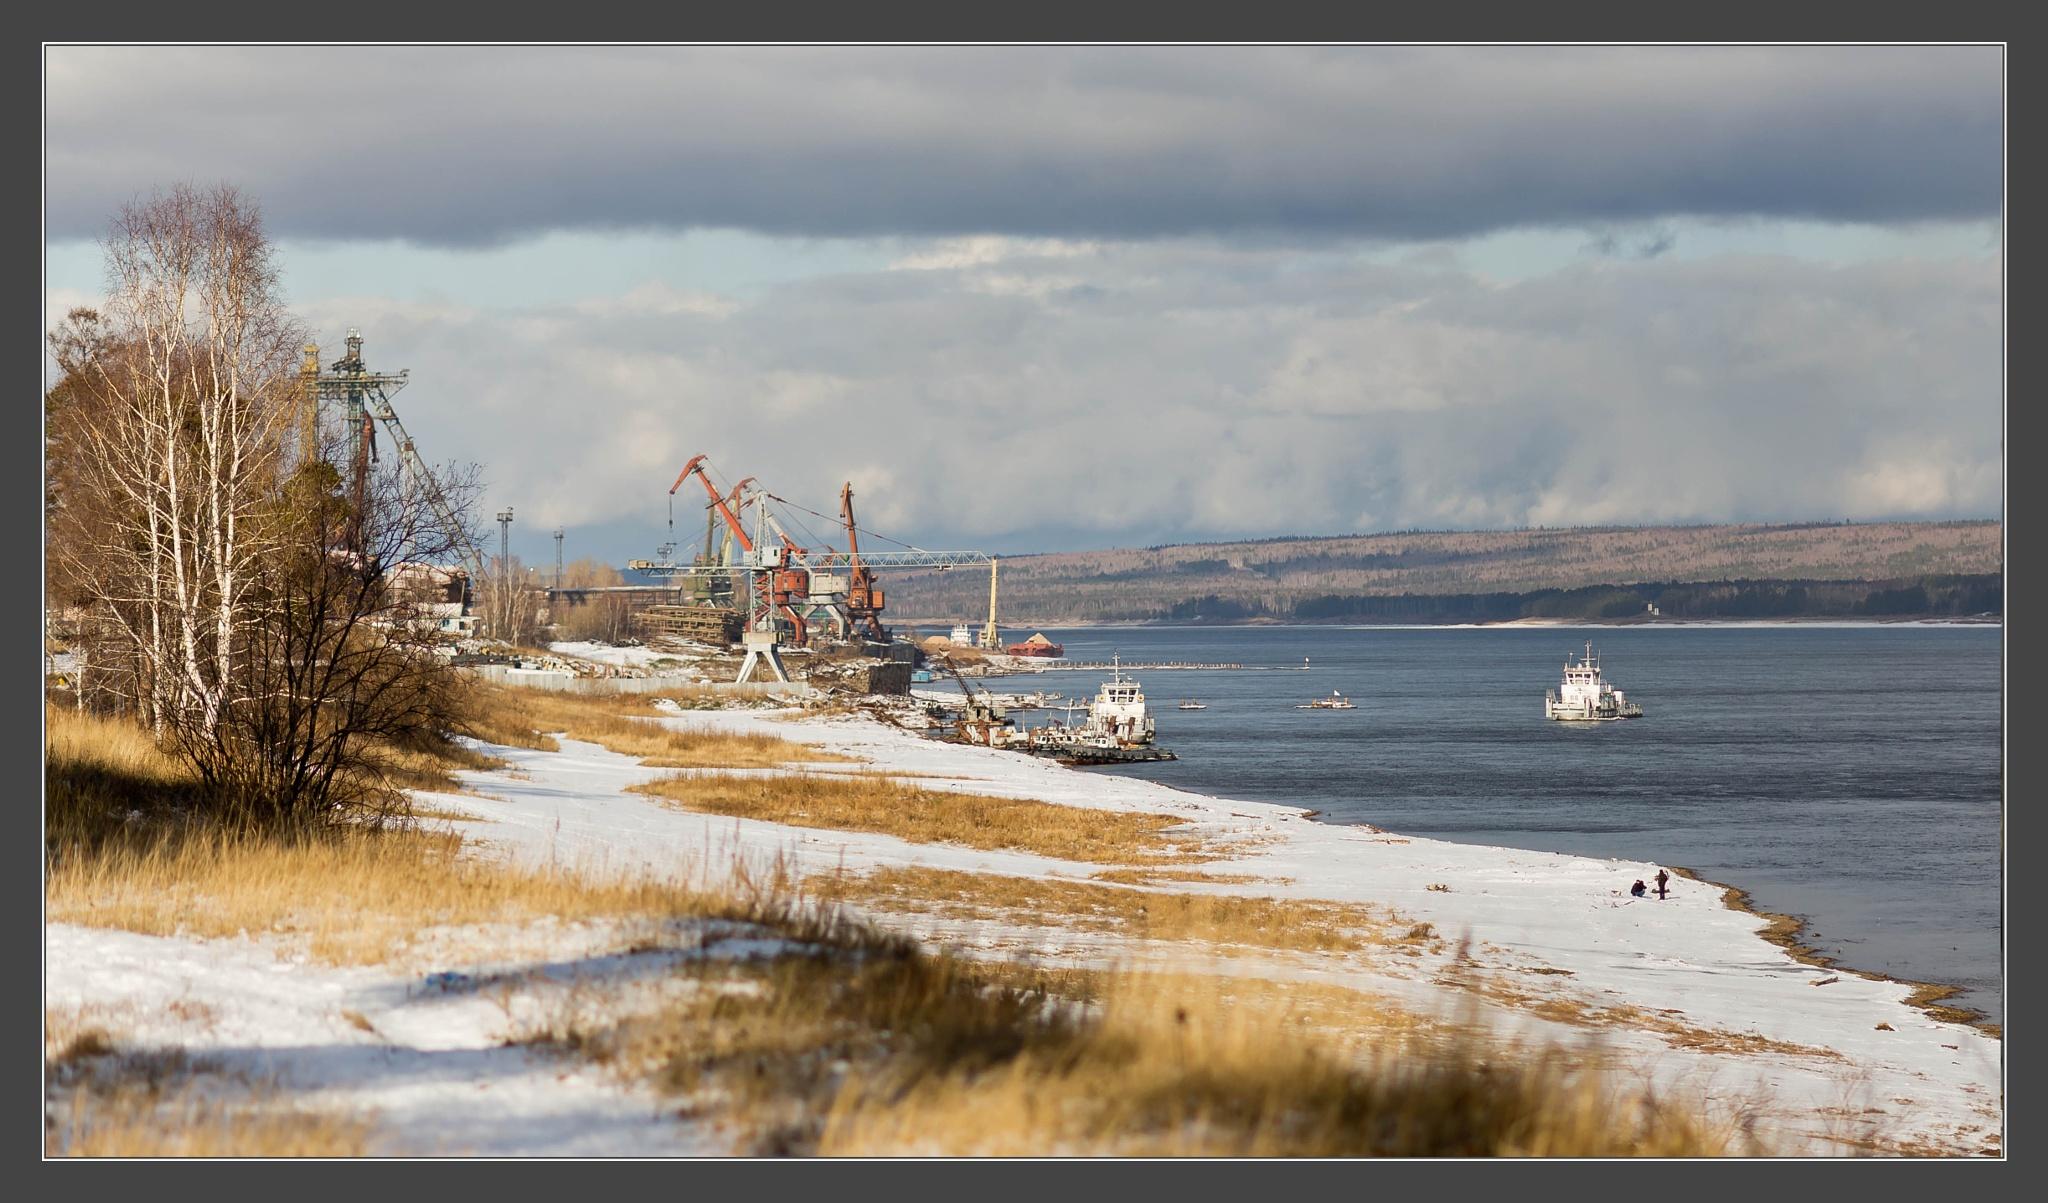 Lesosibirsk, port LDK#1 by antiz